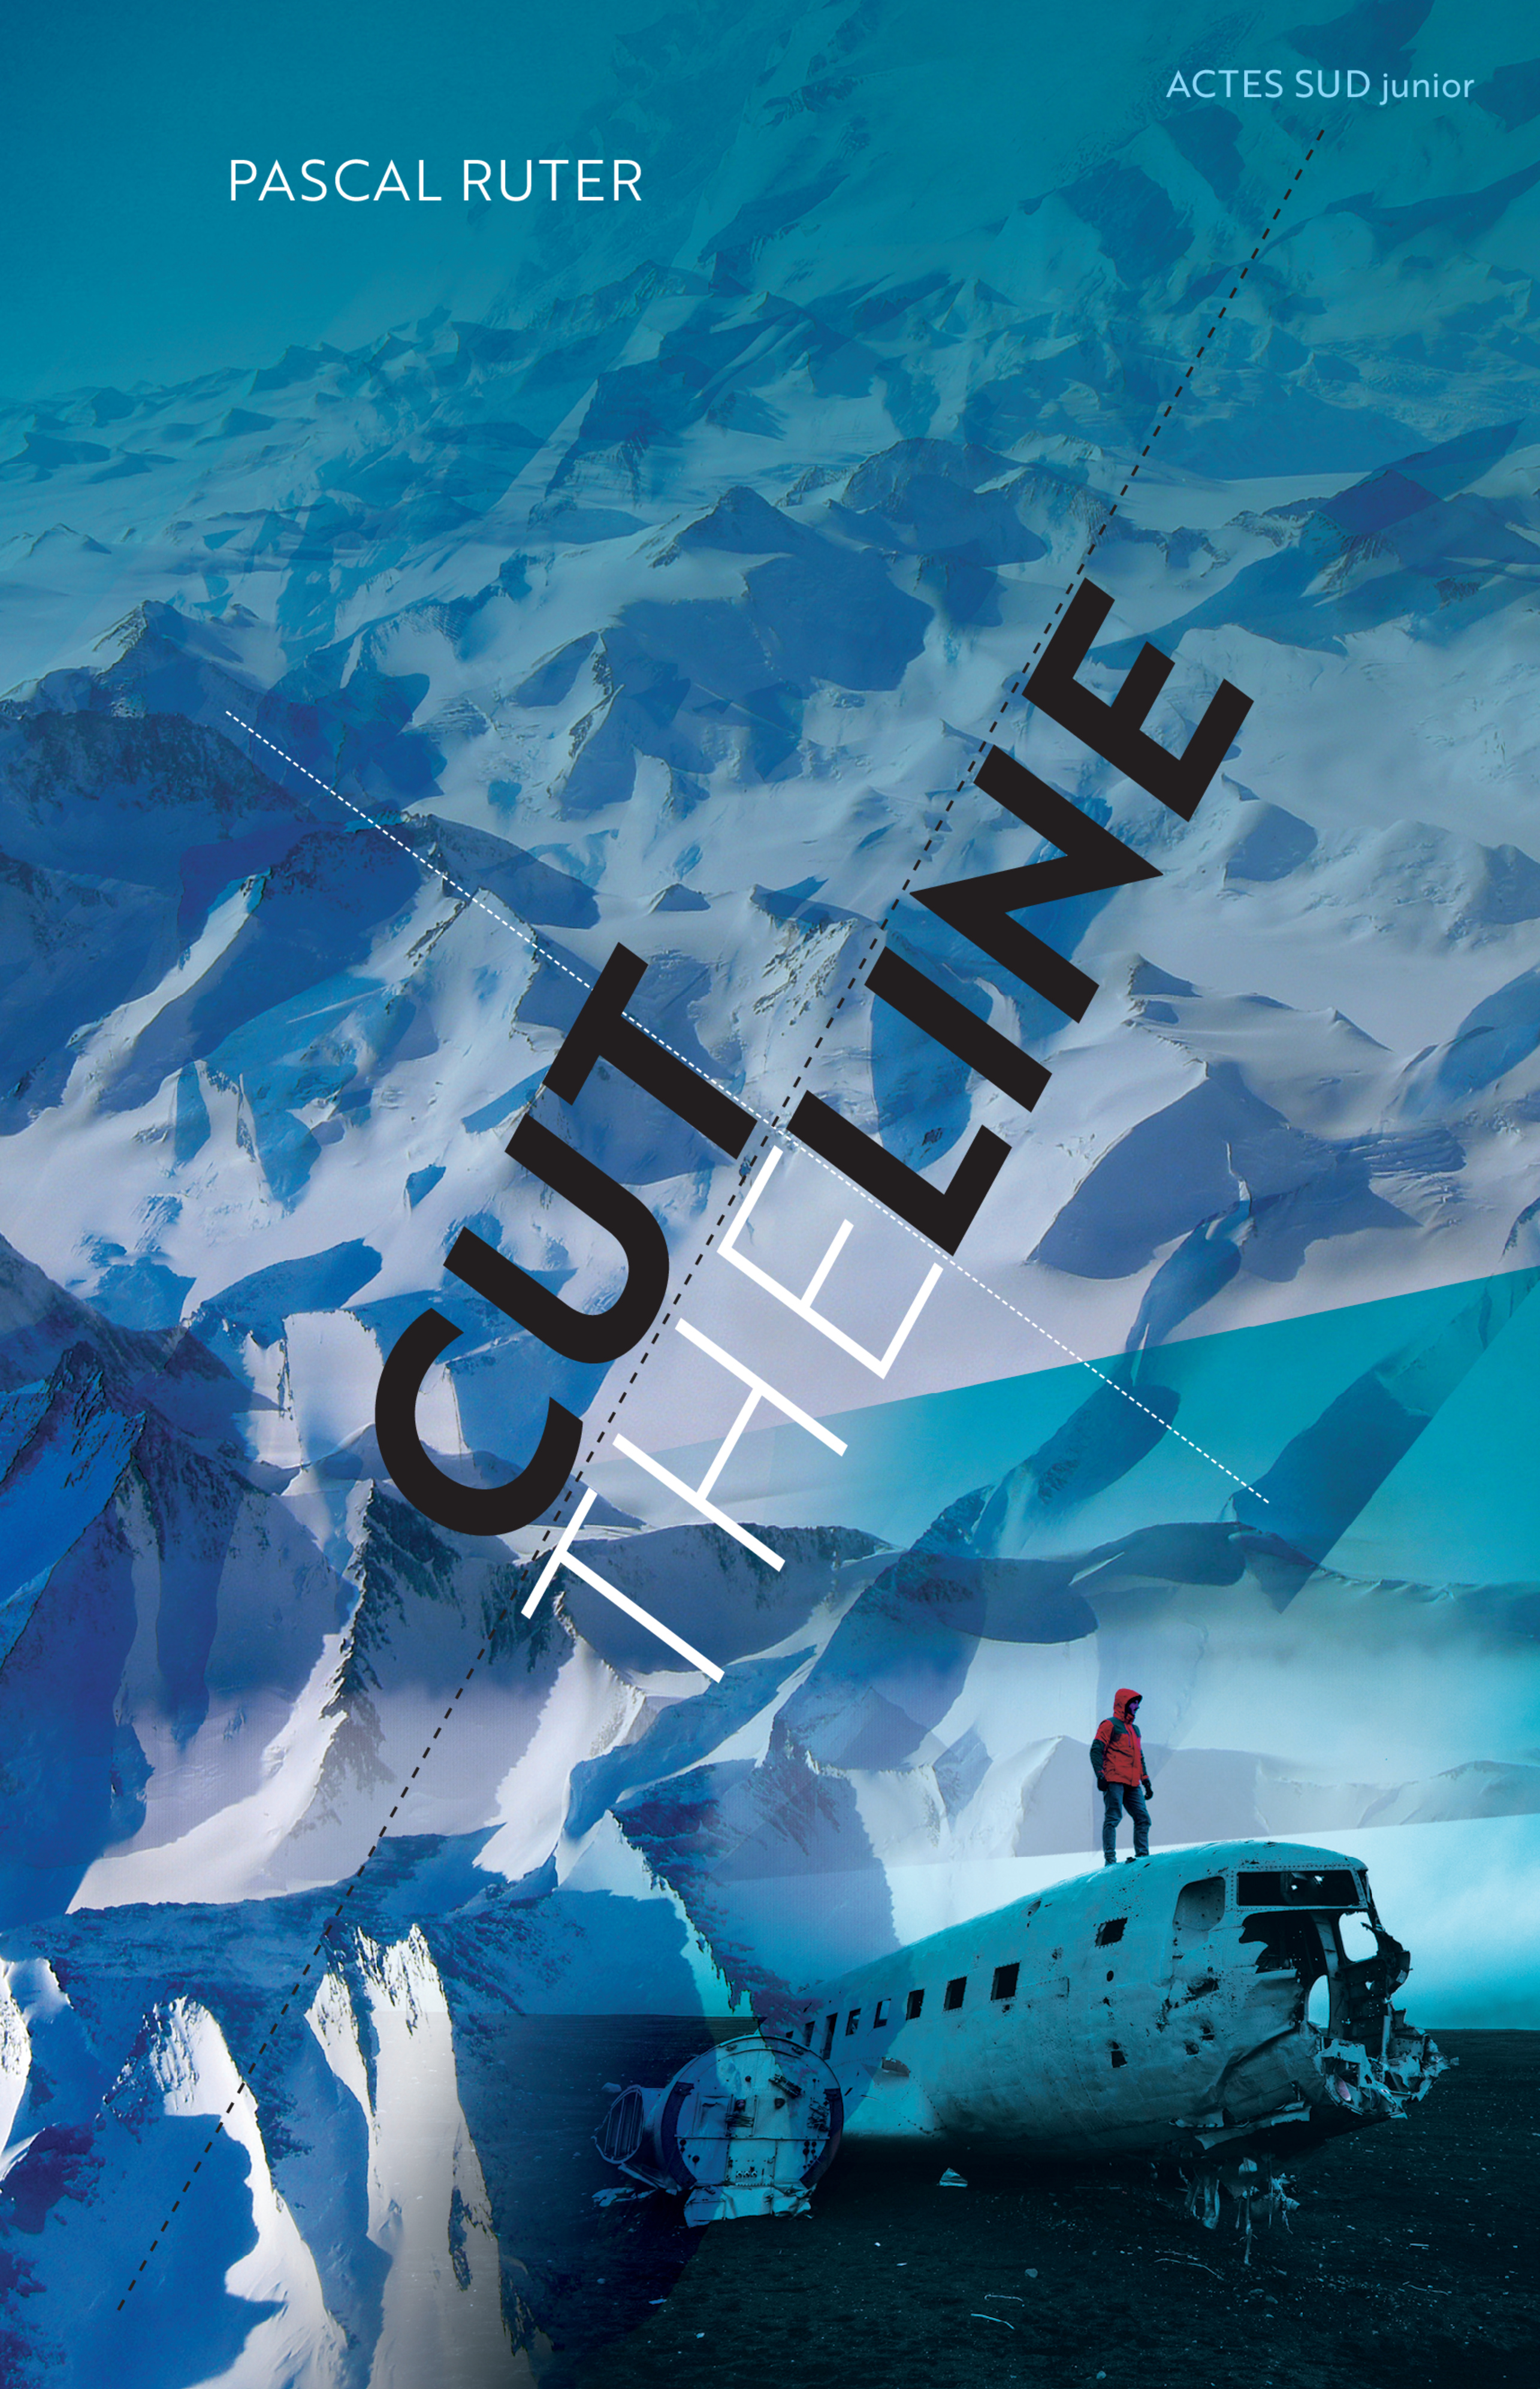 Cut the line | Ruter, Pascal